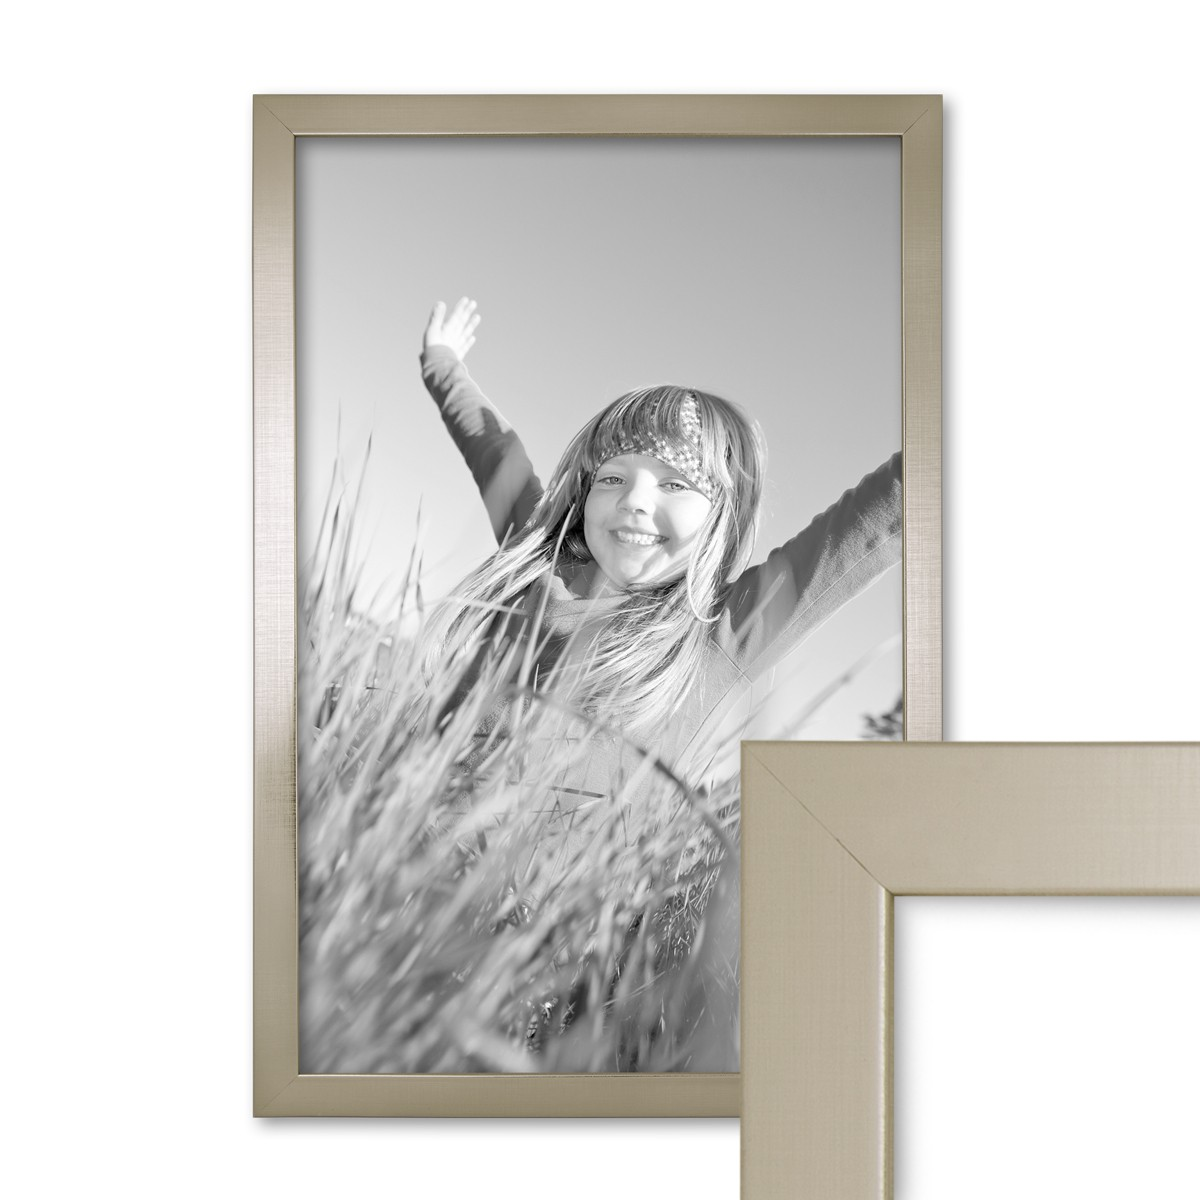 bilderrahmen 30x42 cm din a3 silber modern massivholz rahmen mit glasscheibe inkl zubeh r. Black Bedroom Furniture Sets. Home Design Ideas